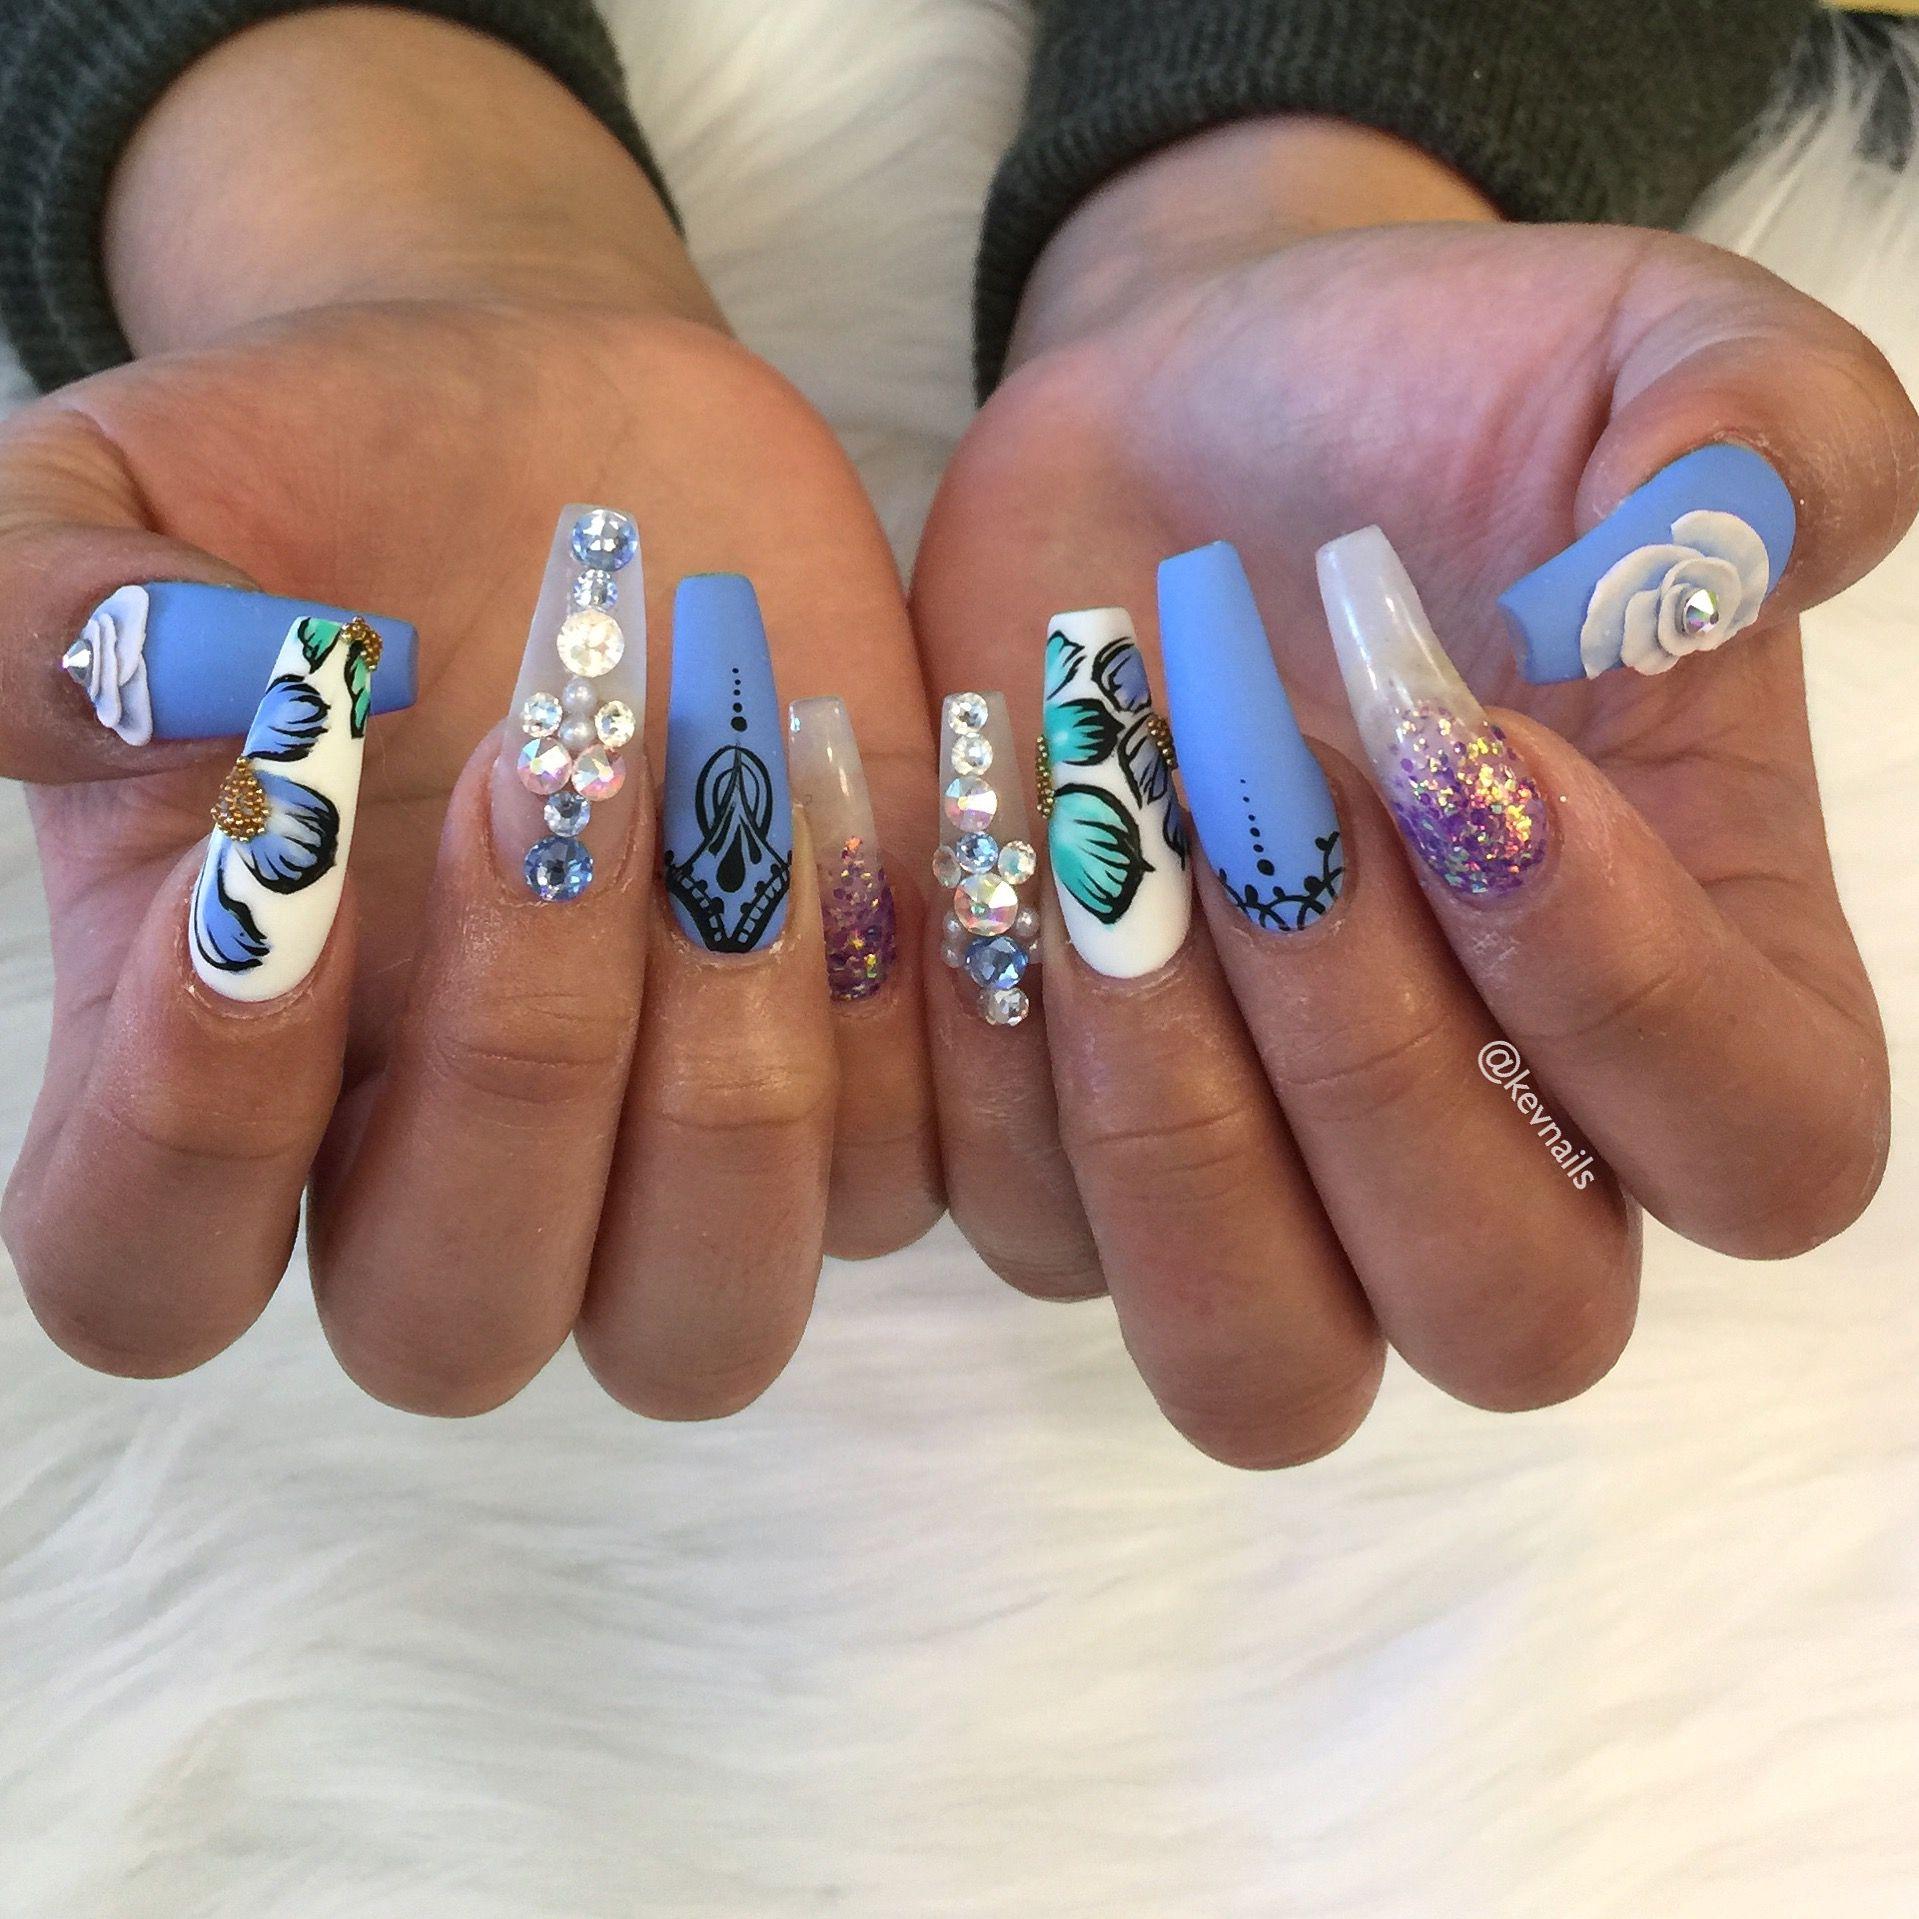 Pin by Kevin Quach on nail art, nail designs, dope nails | Pinterest ...